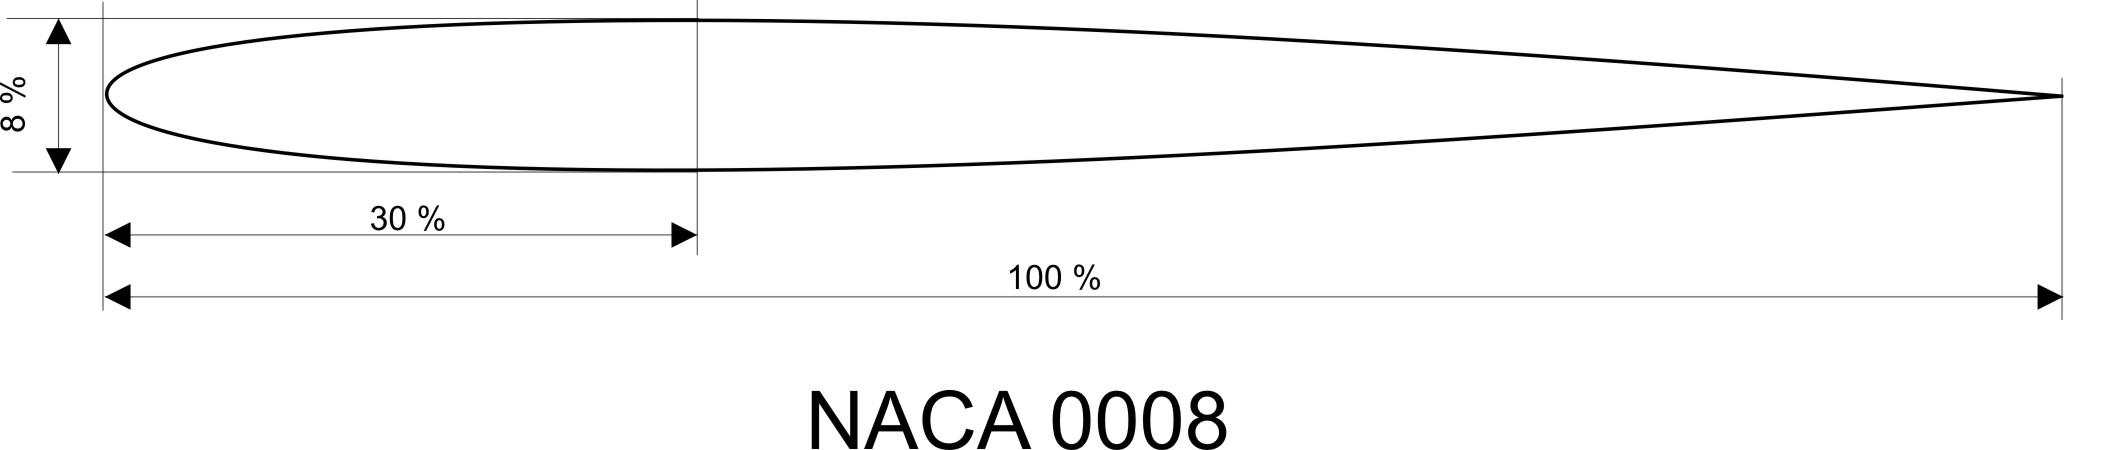 NACA0008